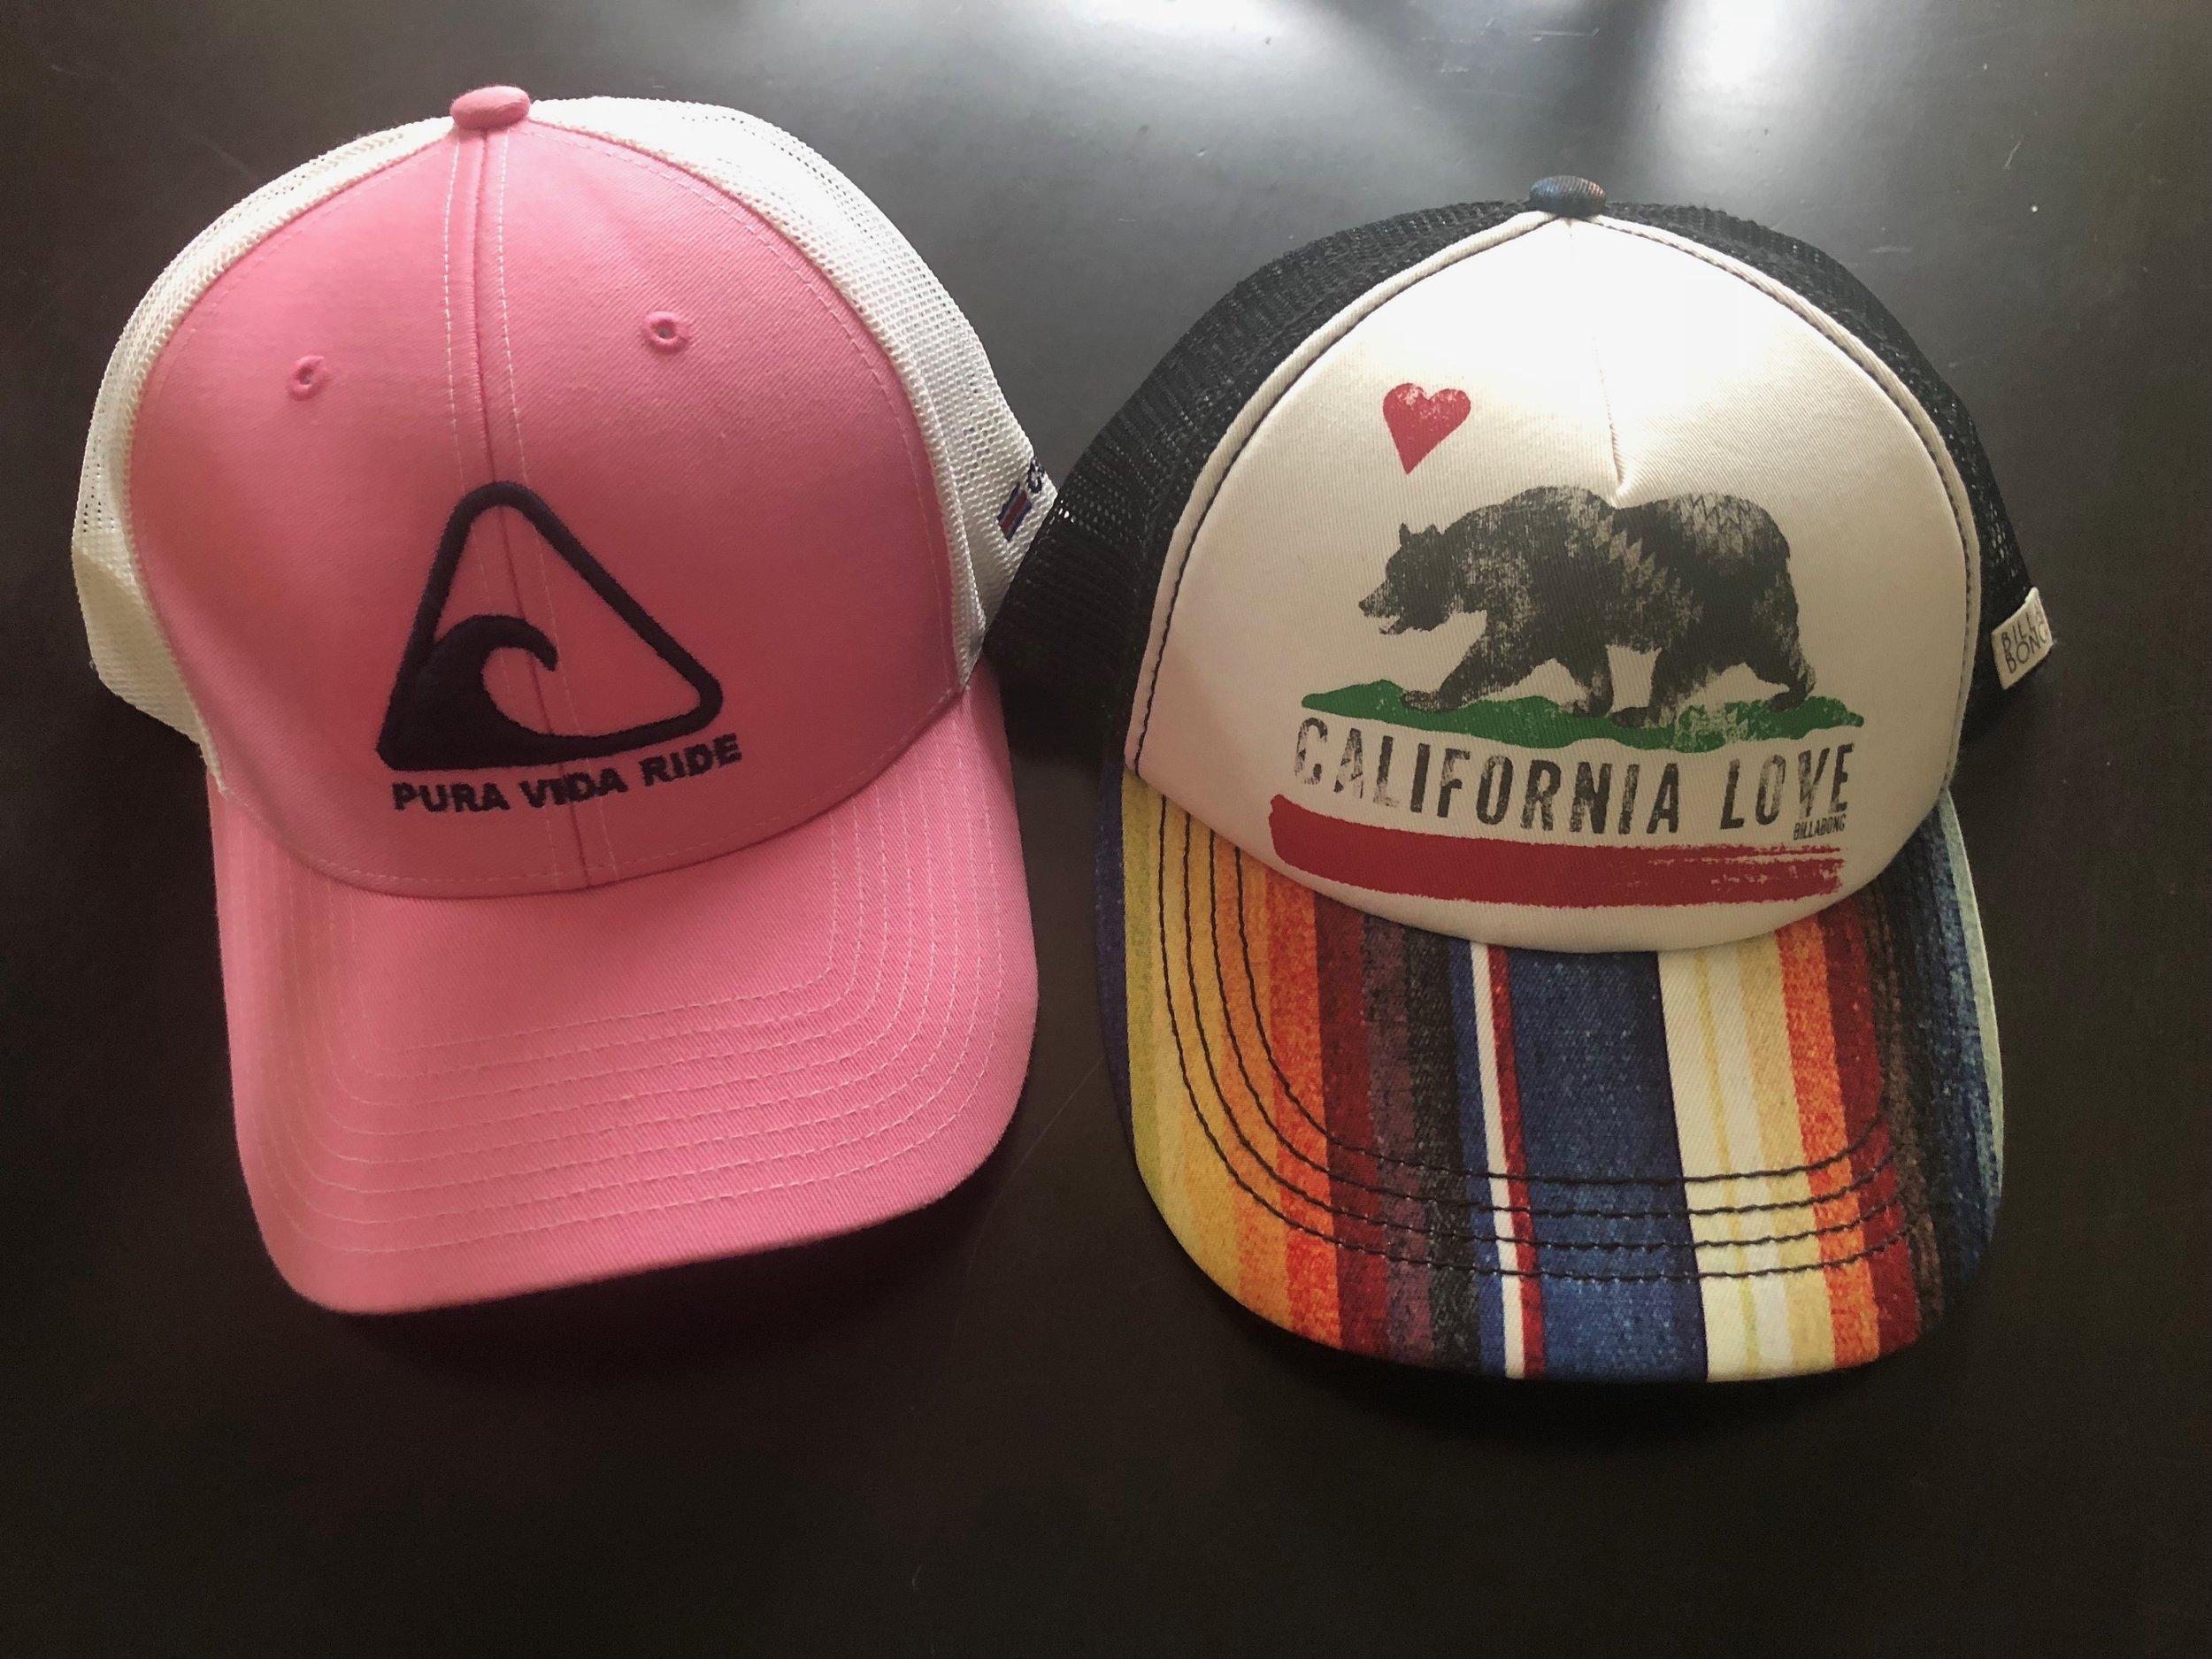 You will not find me wearing the Pura Vida cap in Costa Rica or the California Love hat in California.